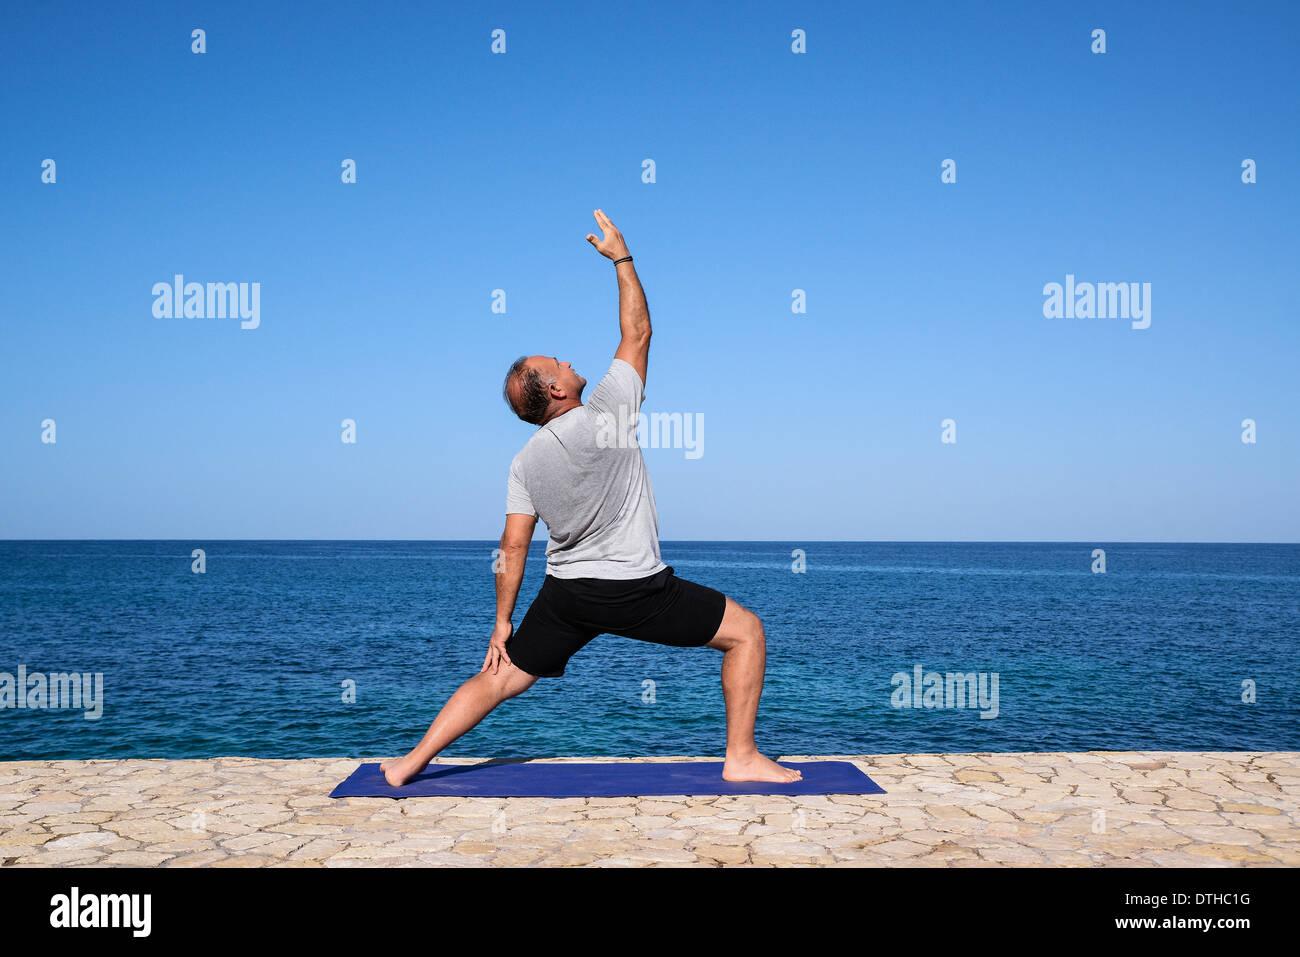 L'uomo pratica yoga meditazione da un oceano waterfront battuta, Negril, Giamaica. Immagini Stock